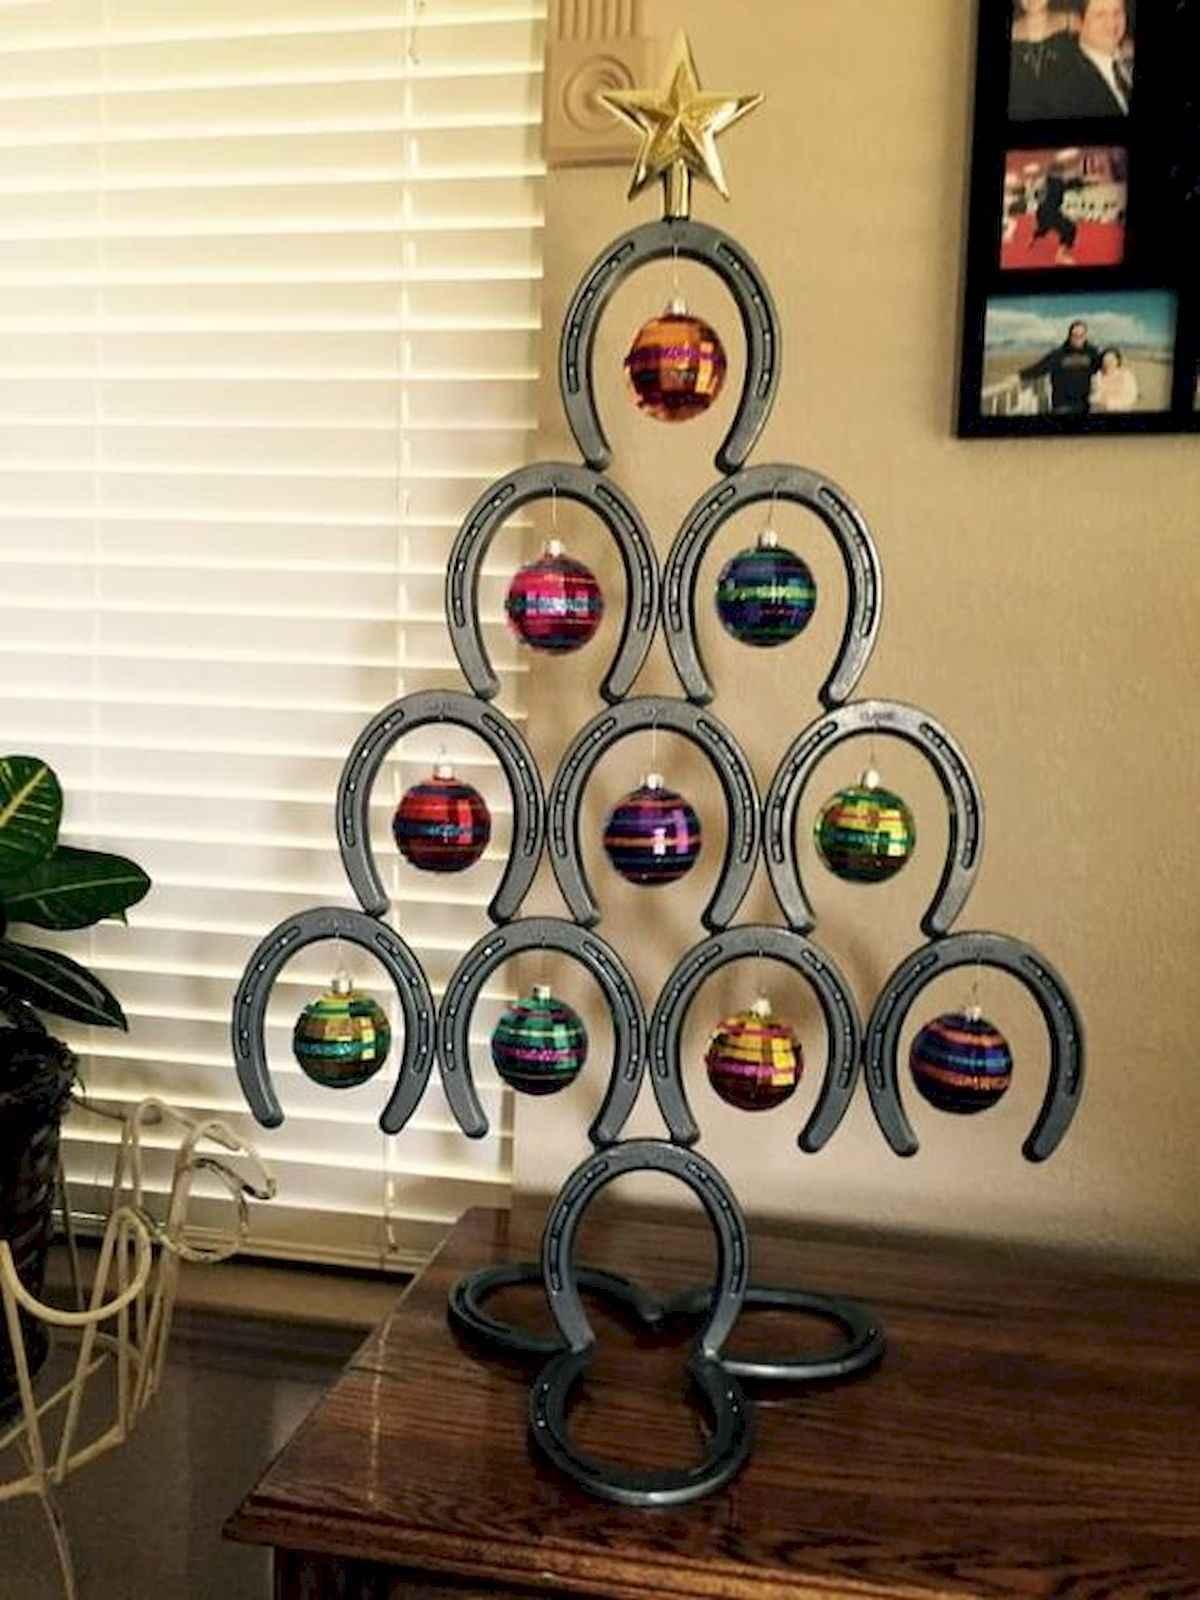 40 unique christmas tree ideas decorations (13)